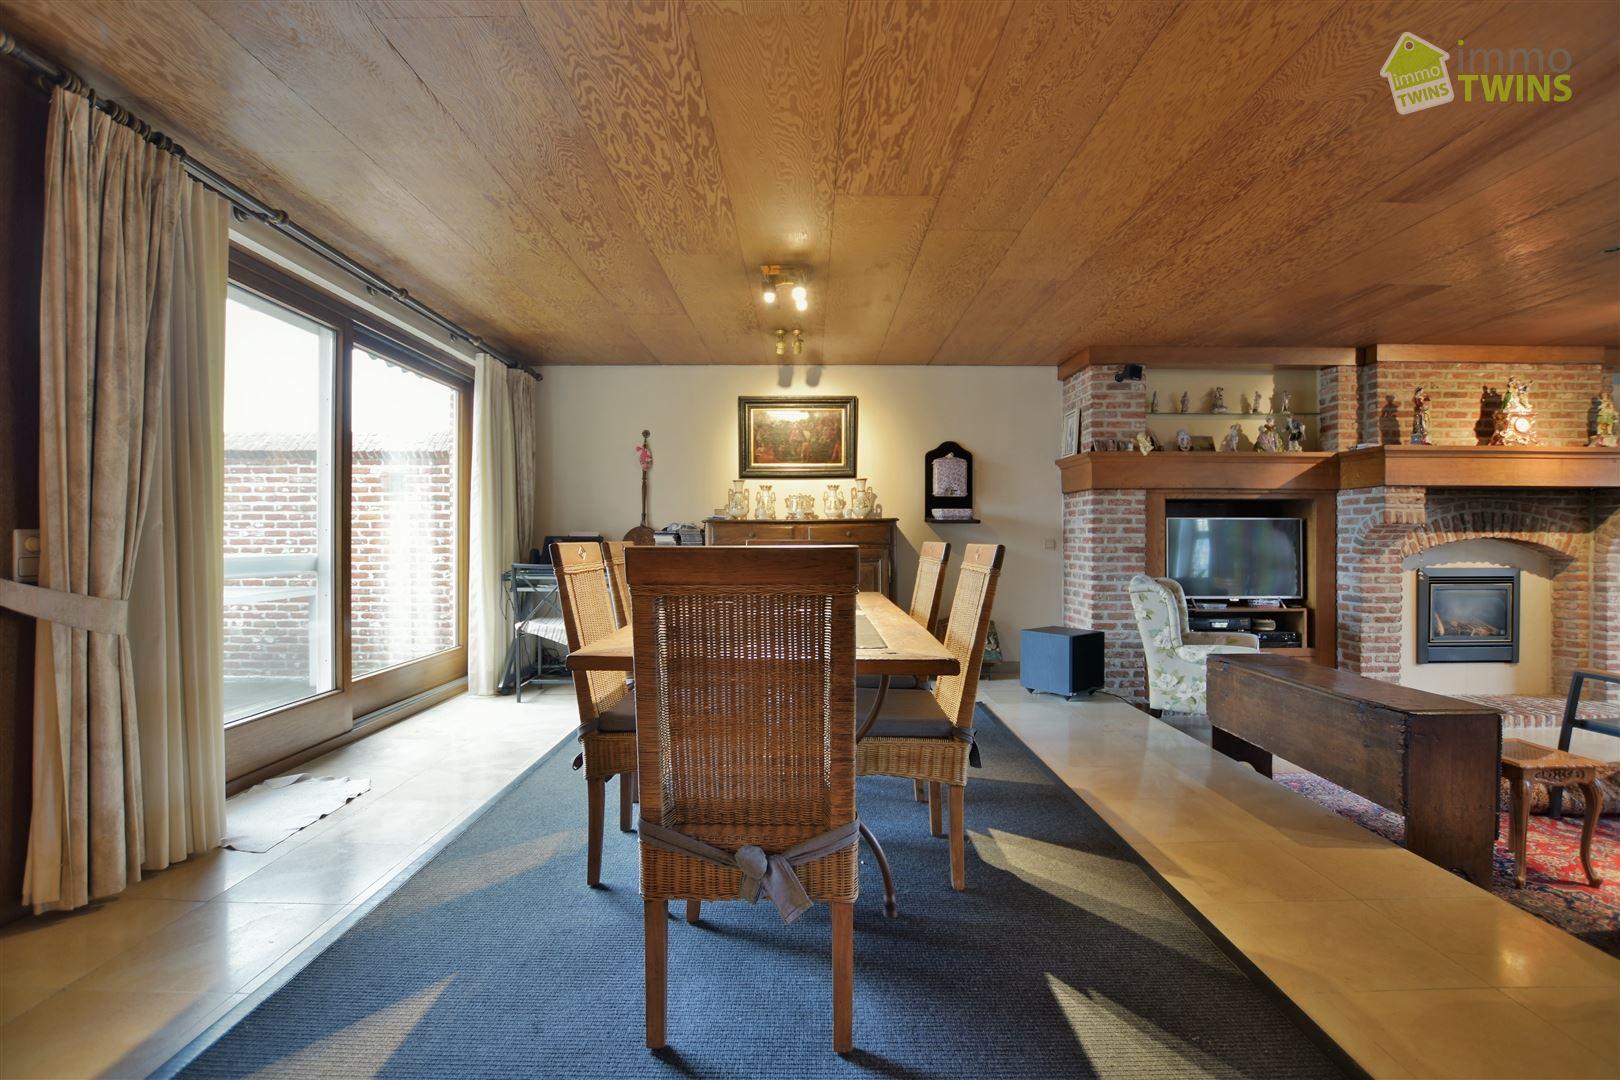 Foto 14 : Duplex/triplex te 9200 Dendermonde (België) - Prijs € 398.000